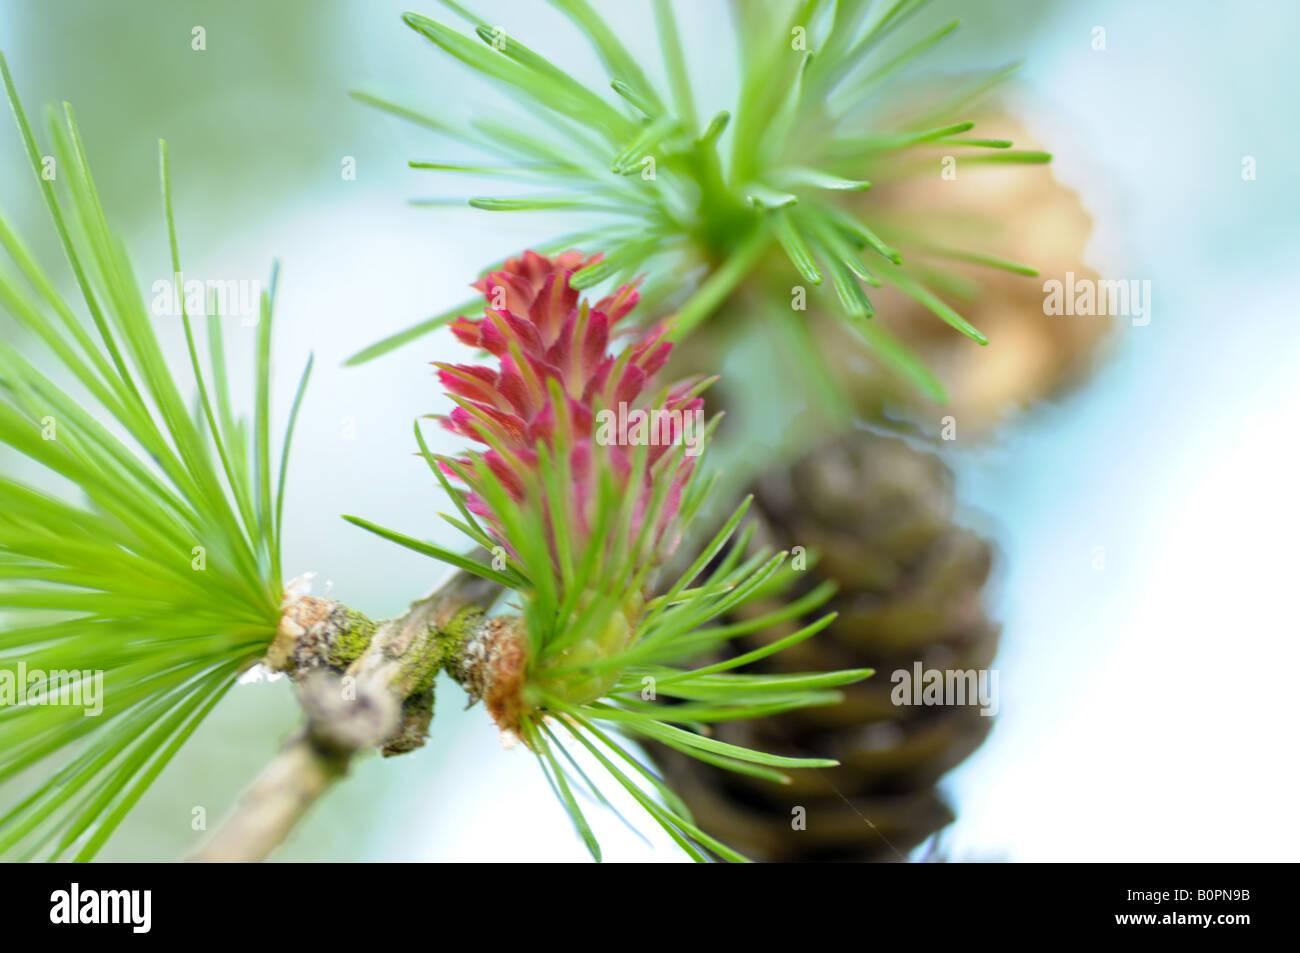 The female flower of a larch tree (Larix decidua) Stock Photo